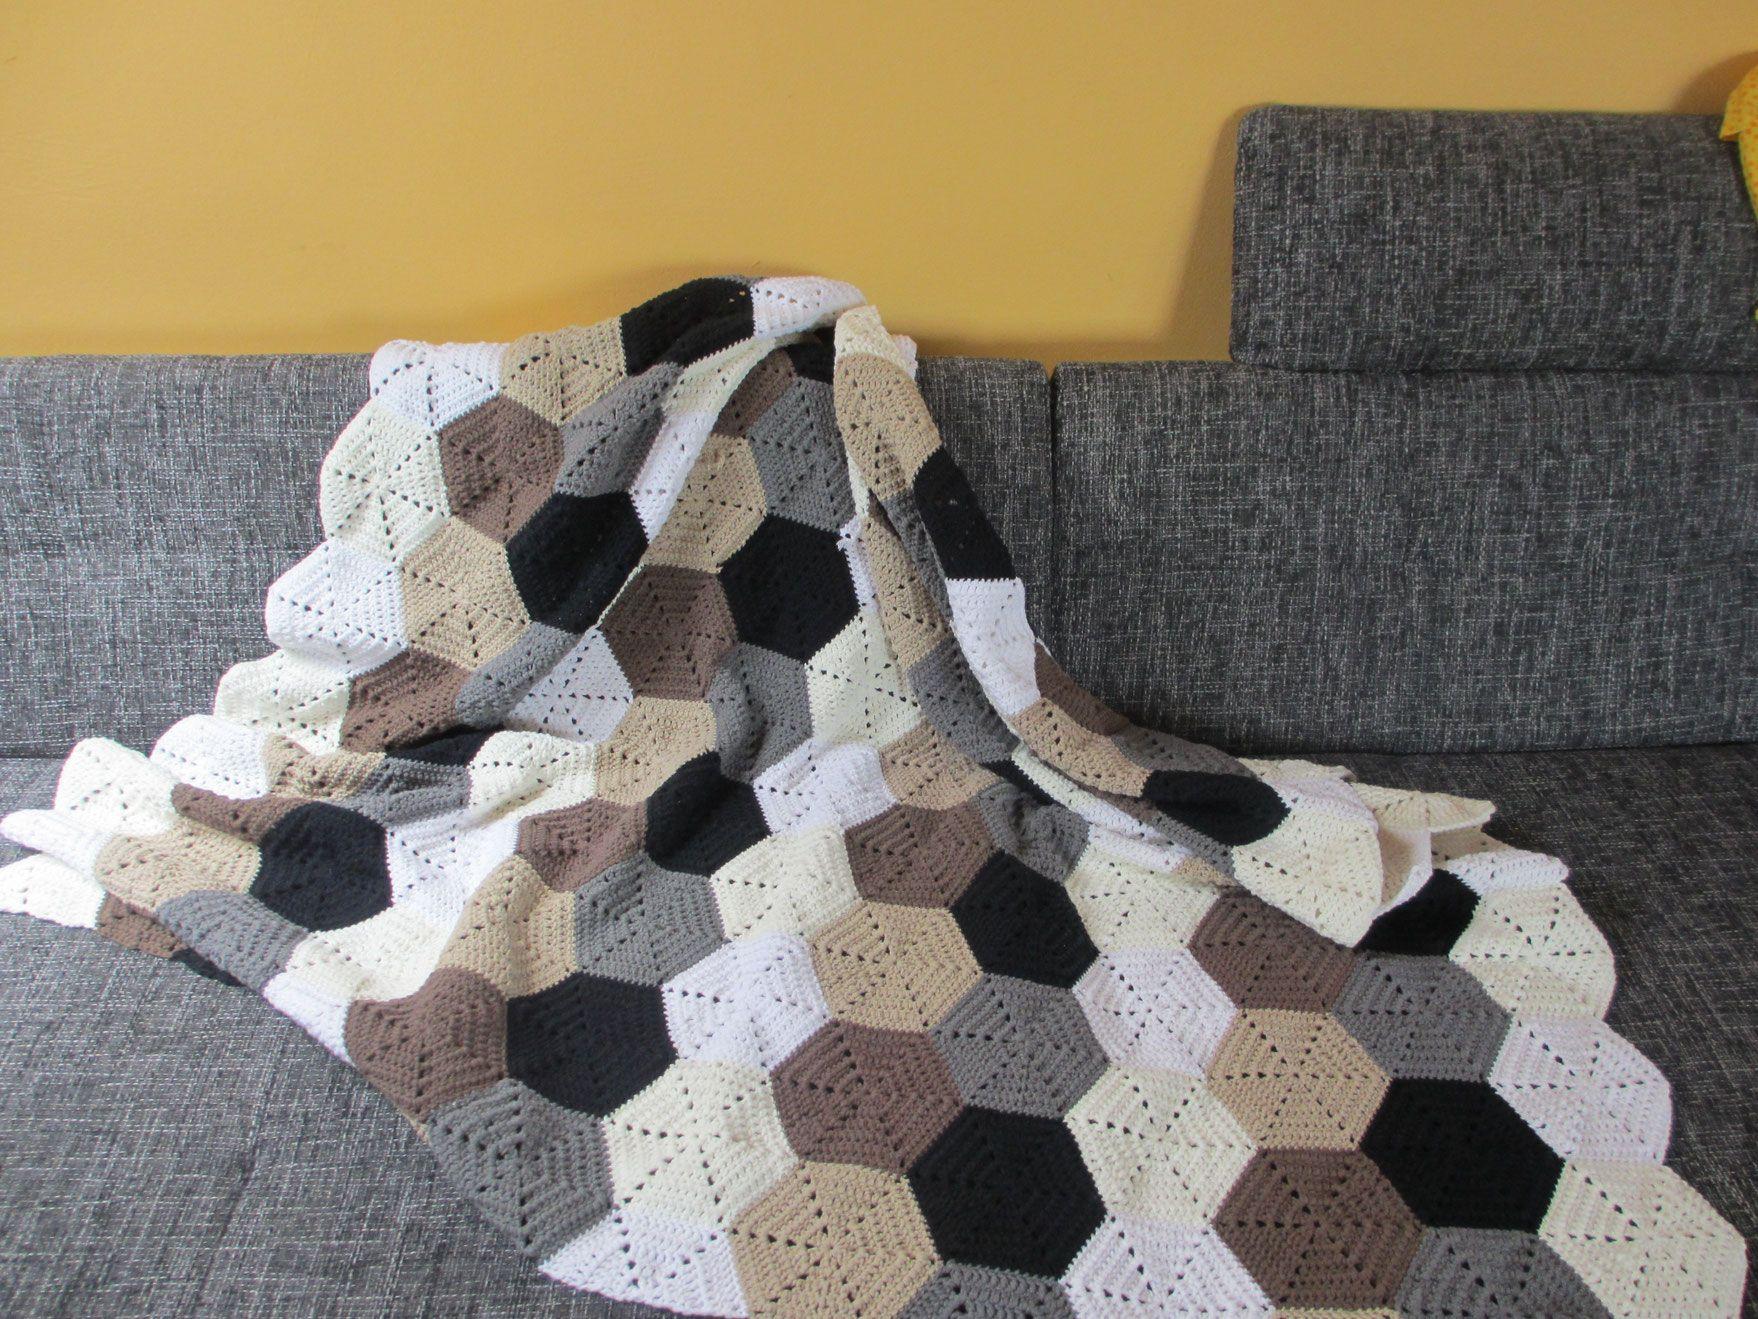 Hexagon-Decke / hexagon blanket - by LeoniaHickox.net